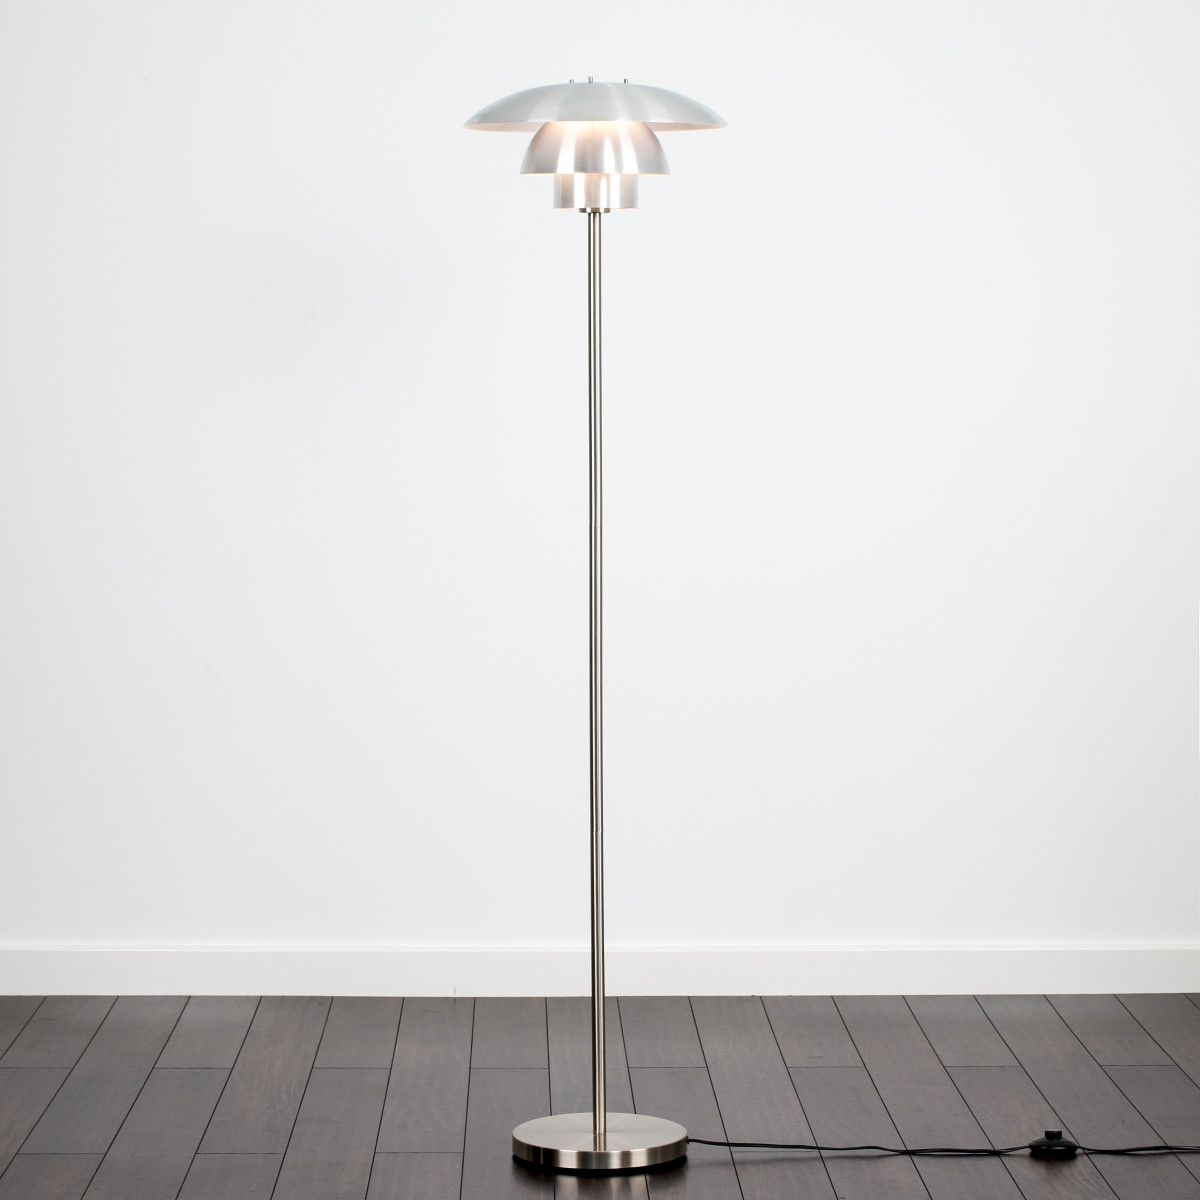 Stakke 3 Tier Floor Lamp